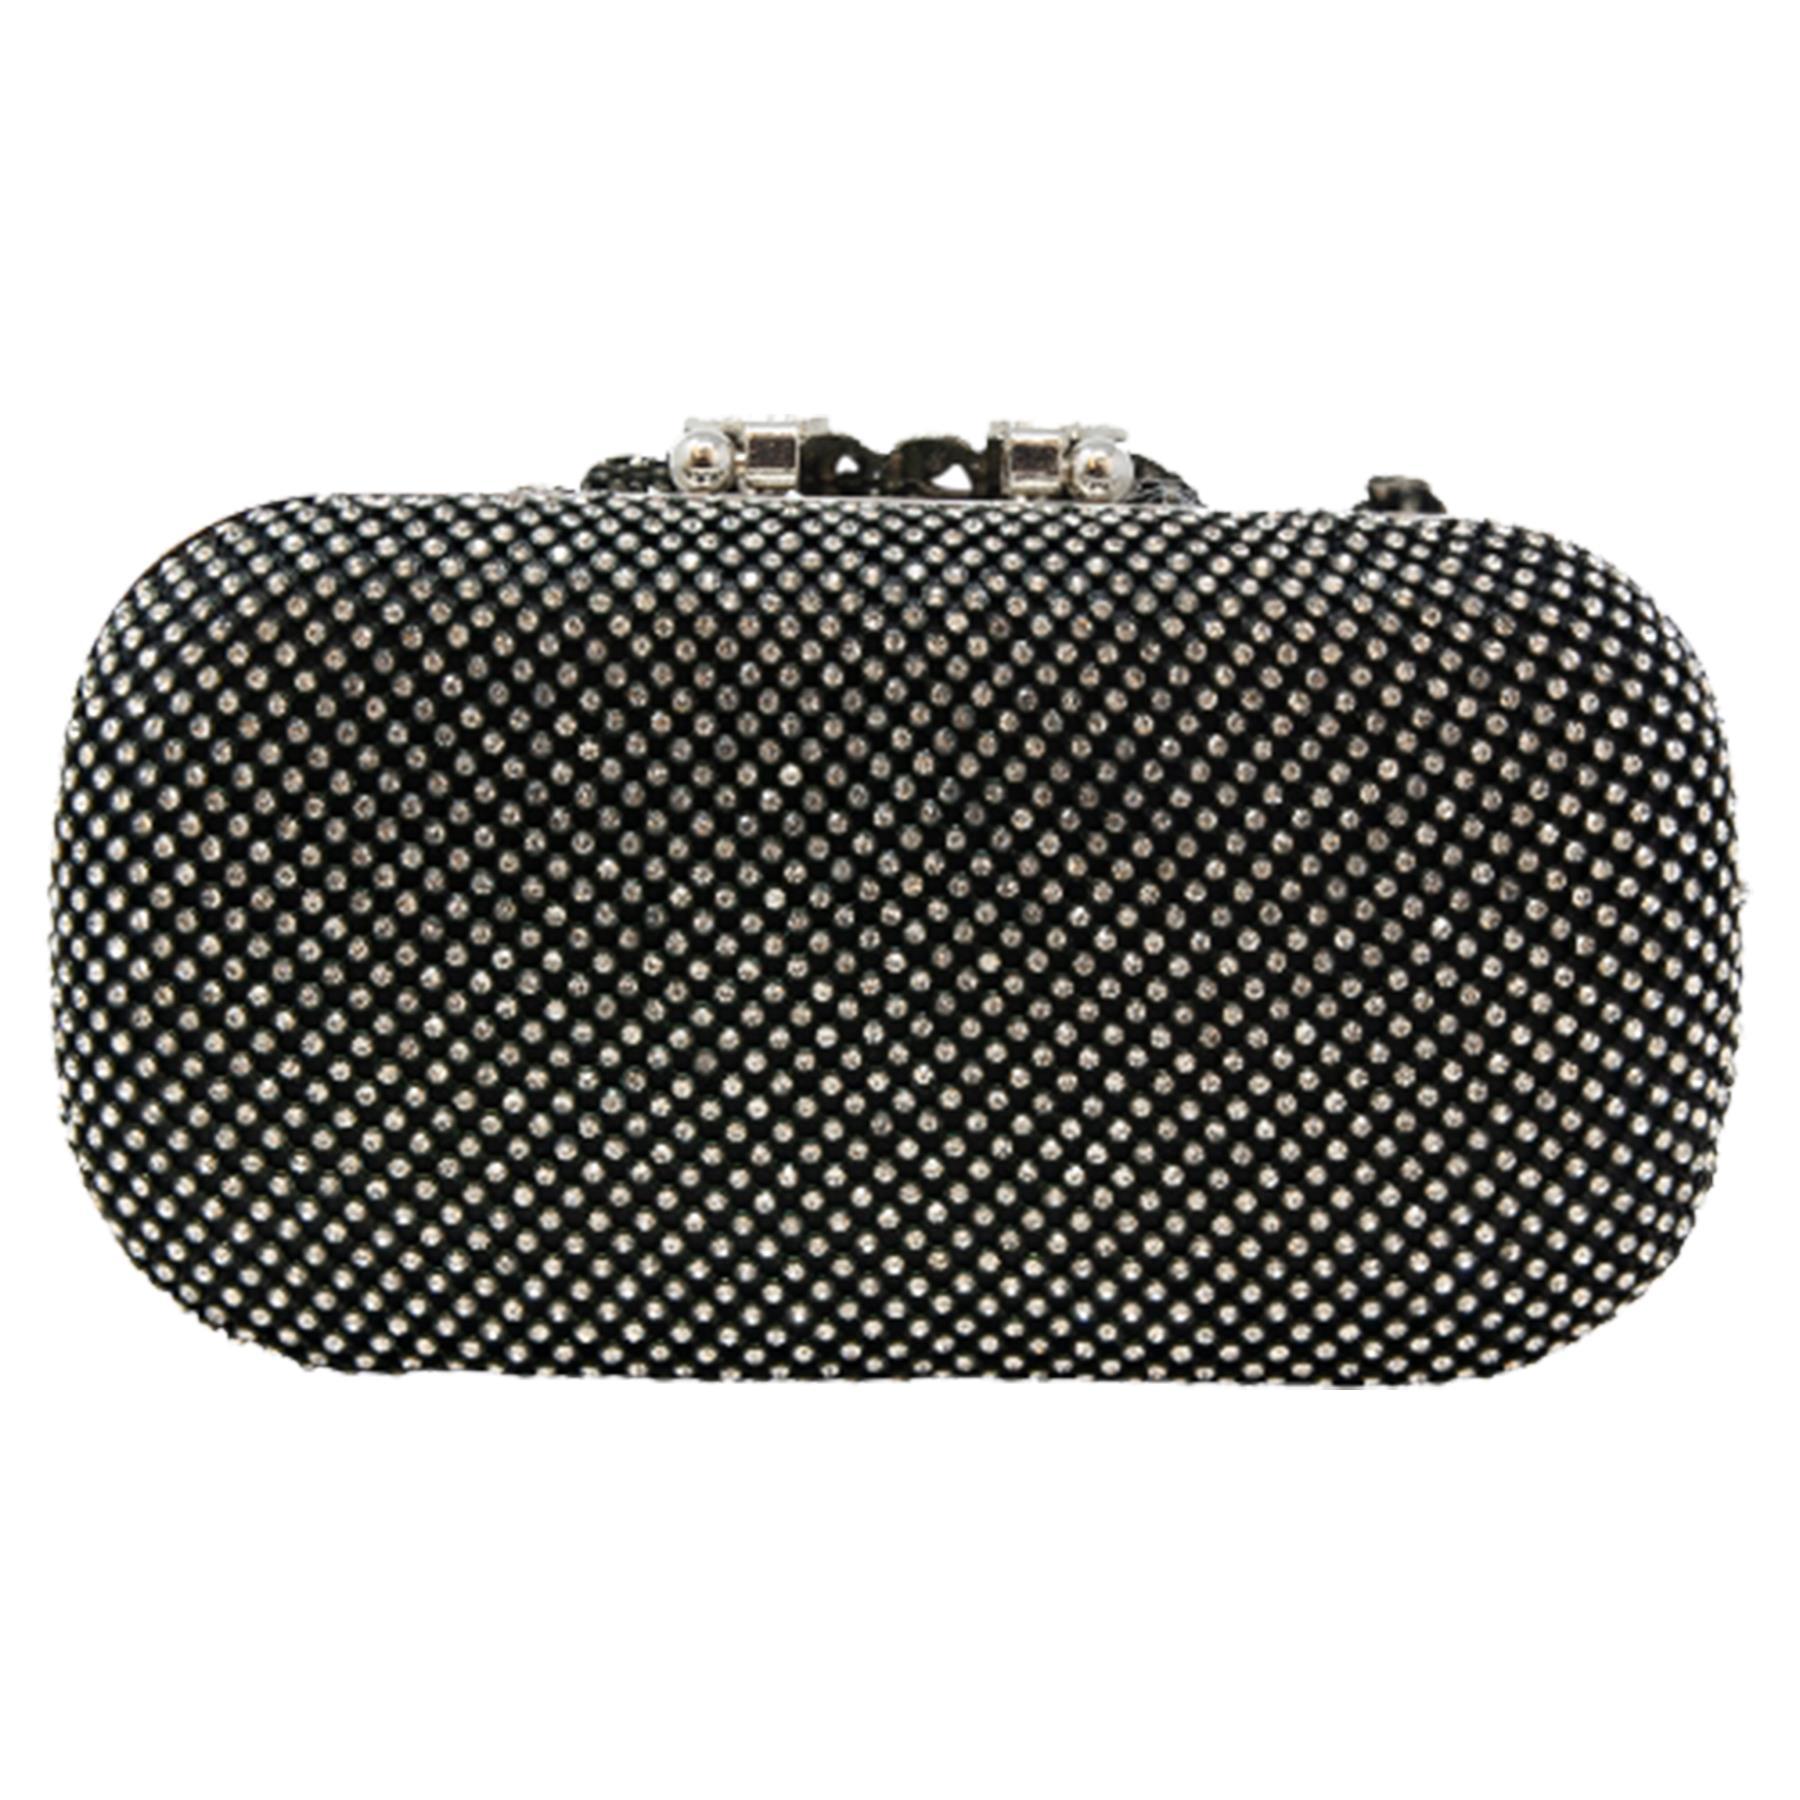 New-Women-s-Jewel-Elephant-Detail-Diamante-Chain-Box-Clutch-Bag-Purse thumbnail 5